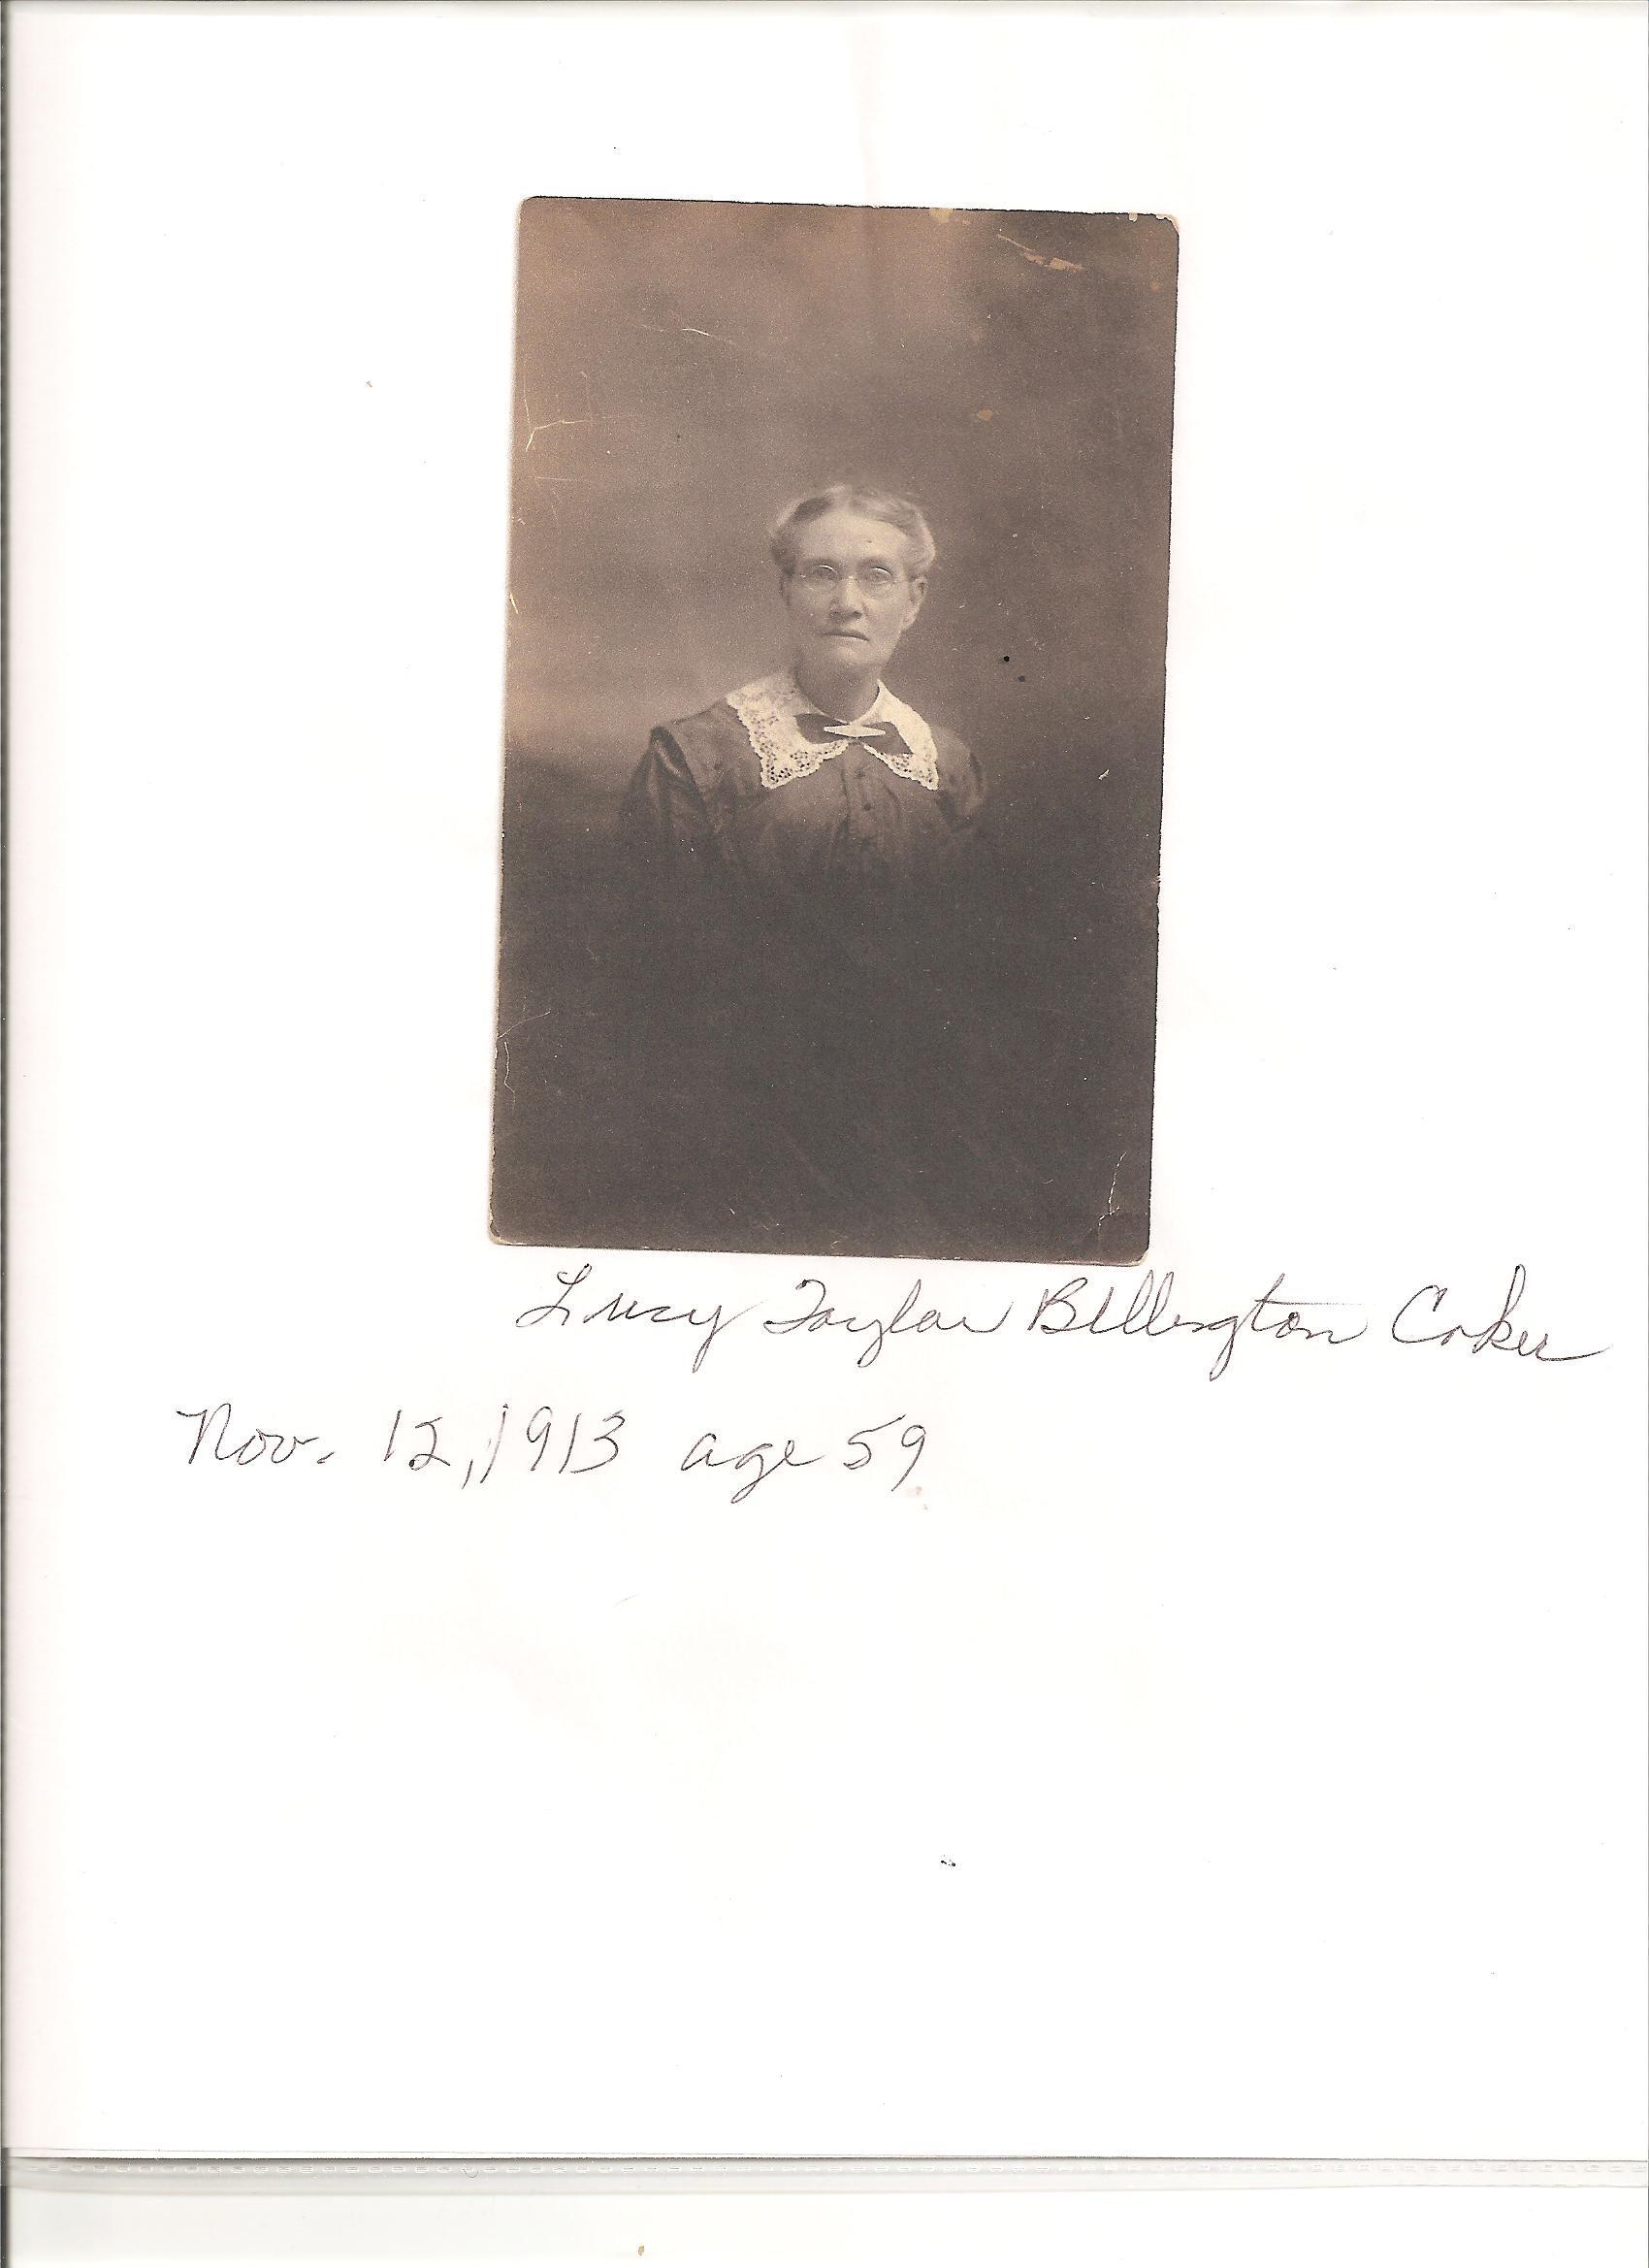 Thomas Watson Coker